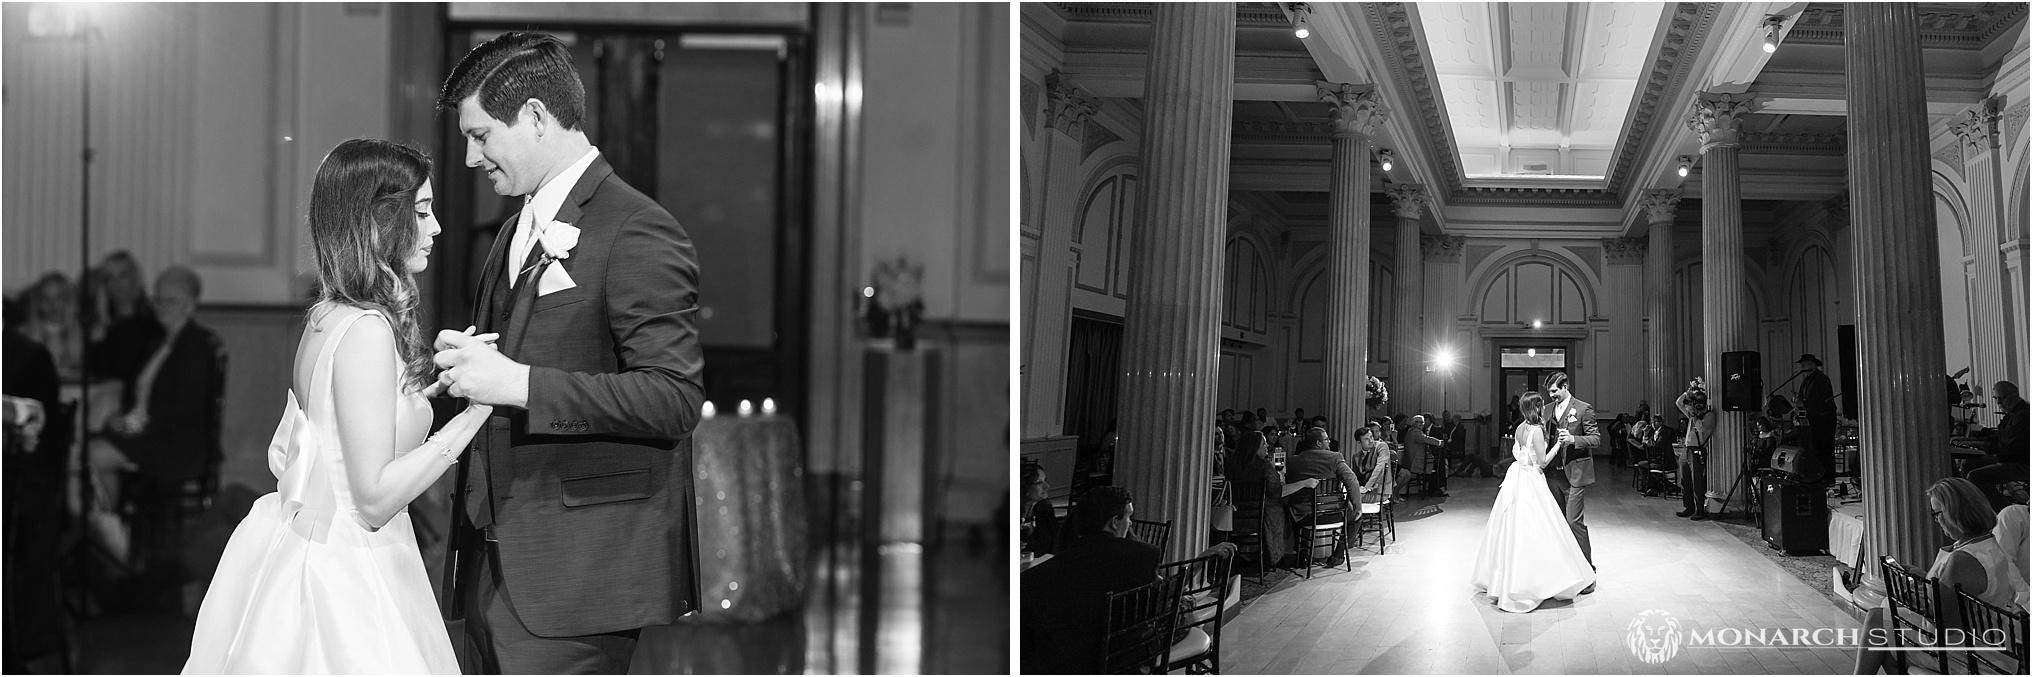 st-augustine-wedding-photographer-106.jpg